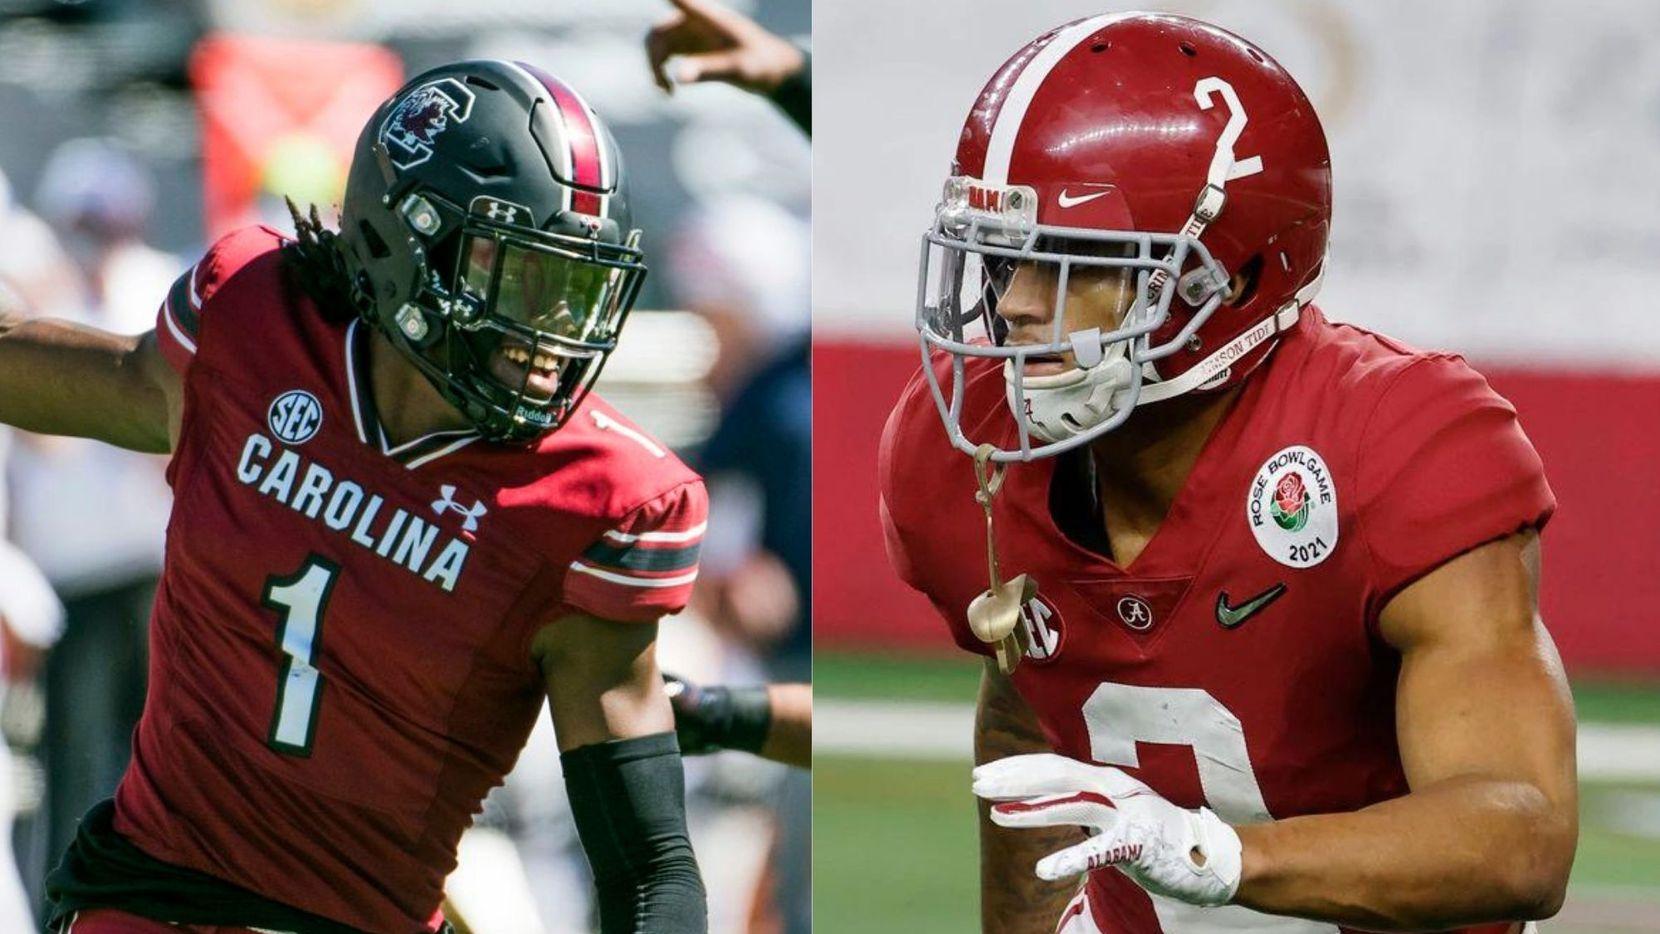 Left: South Carolina CB Jaycee Horn, Right: Alabama CB Patrick Surtain II. (Left: Sean Rayford; Right: Michael Ainsworth/AP)